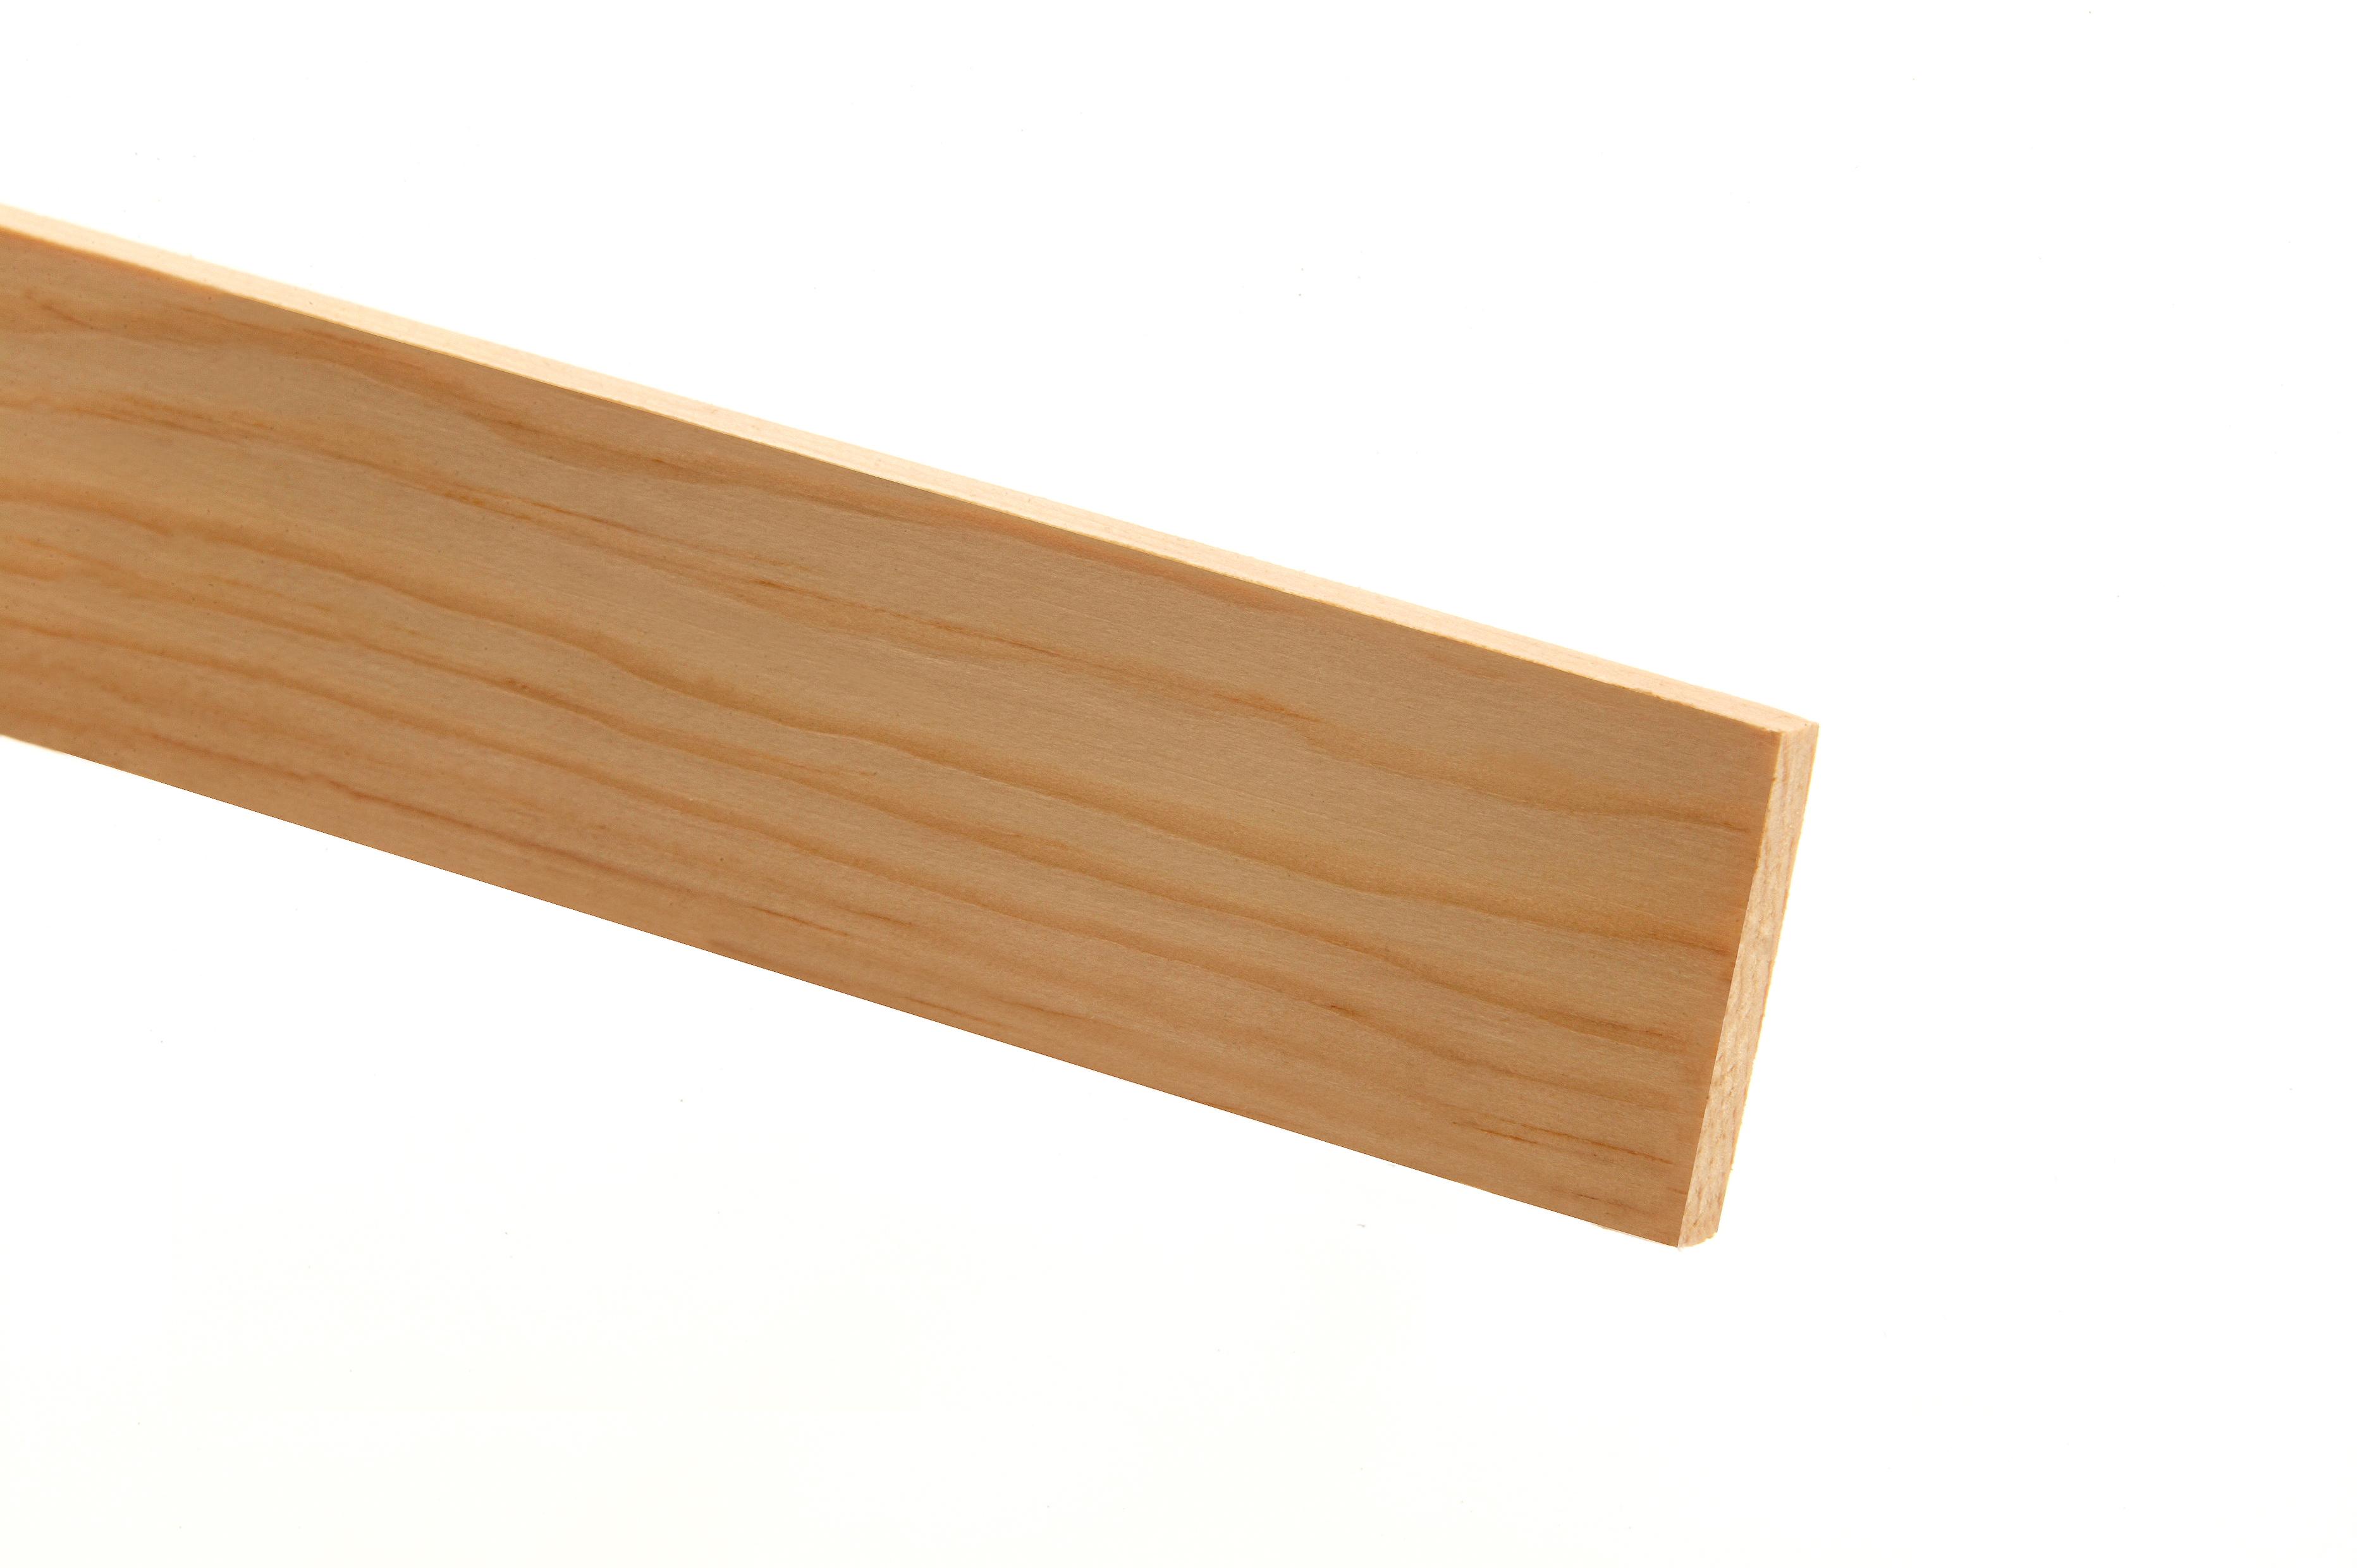 5 Pine PSE Stripwood 21 x 220 x 2400mm